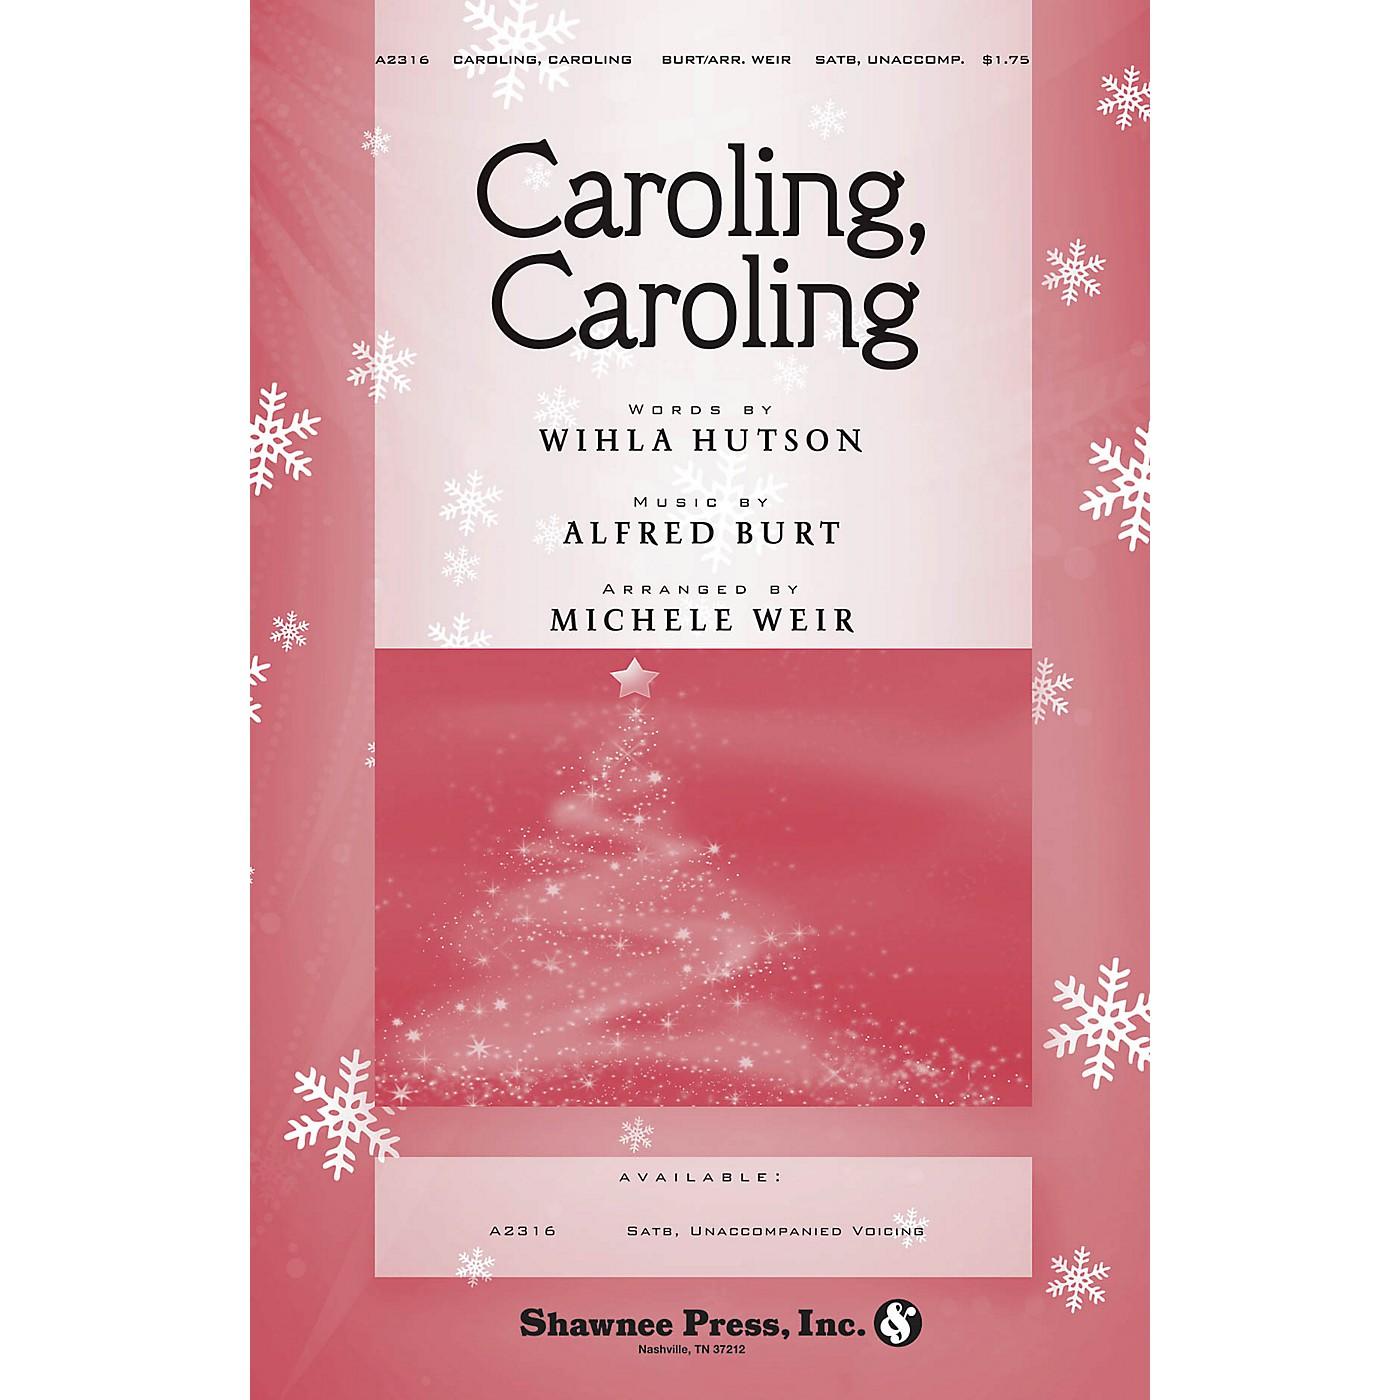 Shawnee Press Caroling, Caroling SATB a cappella arranged by Michele Weir thumbnail